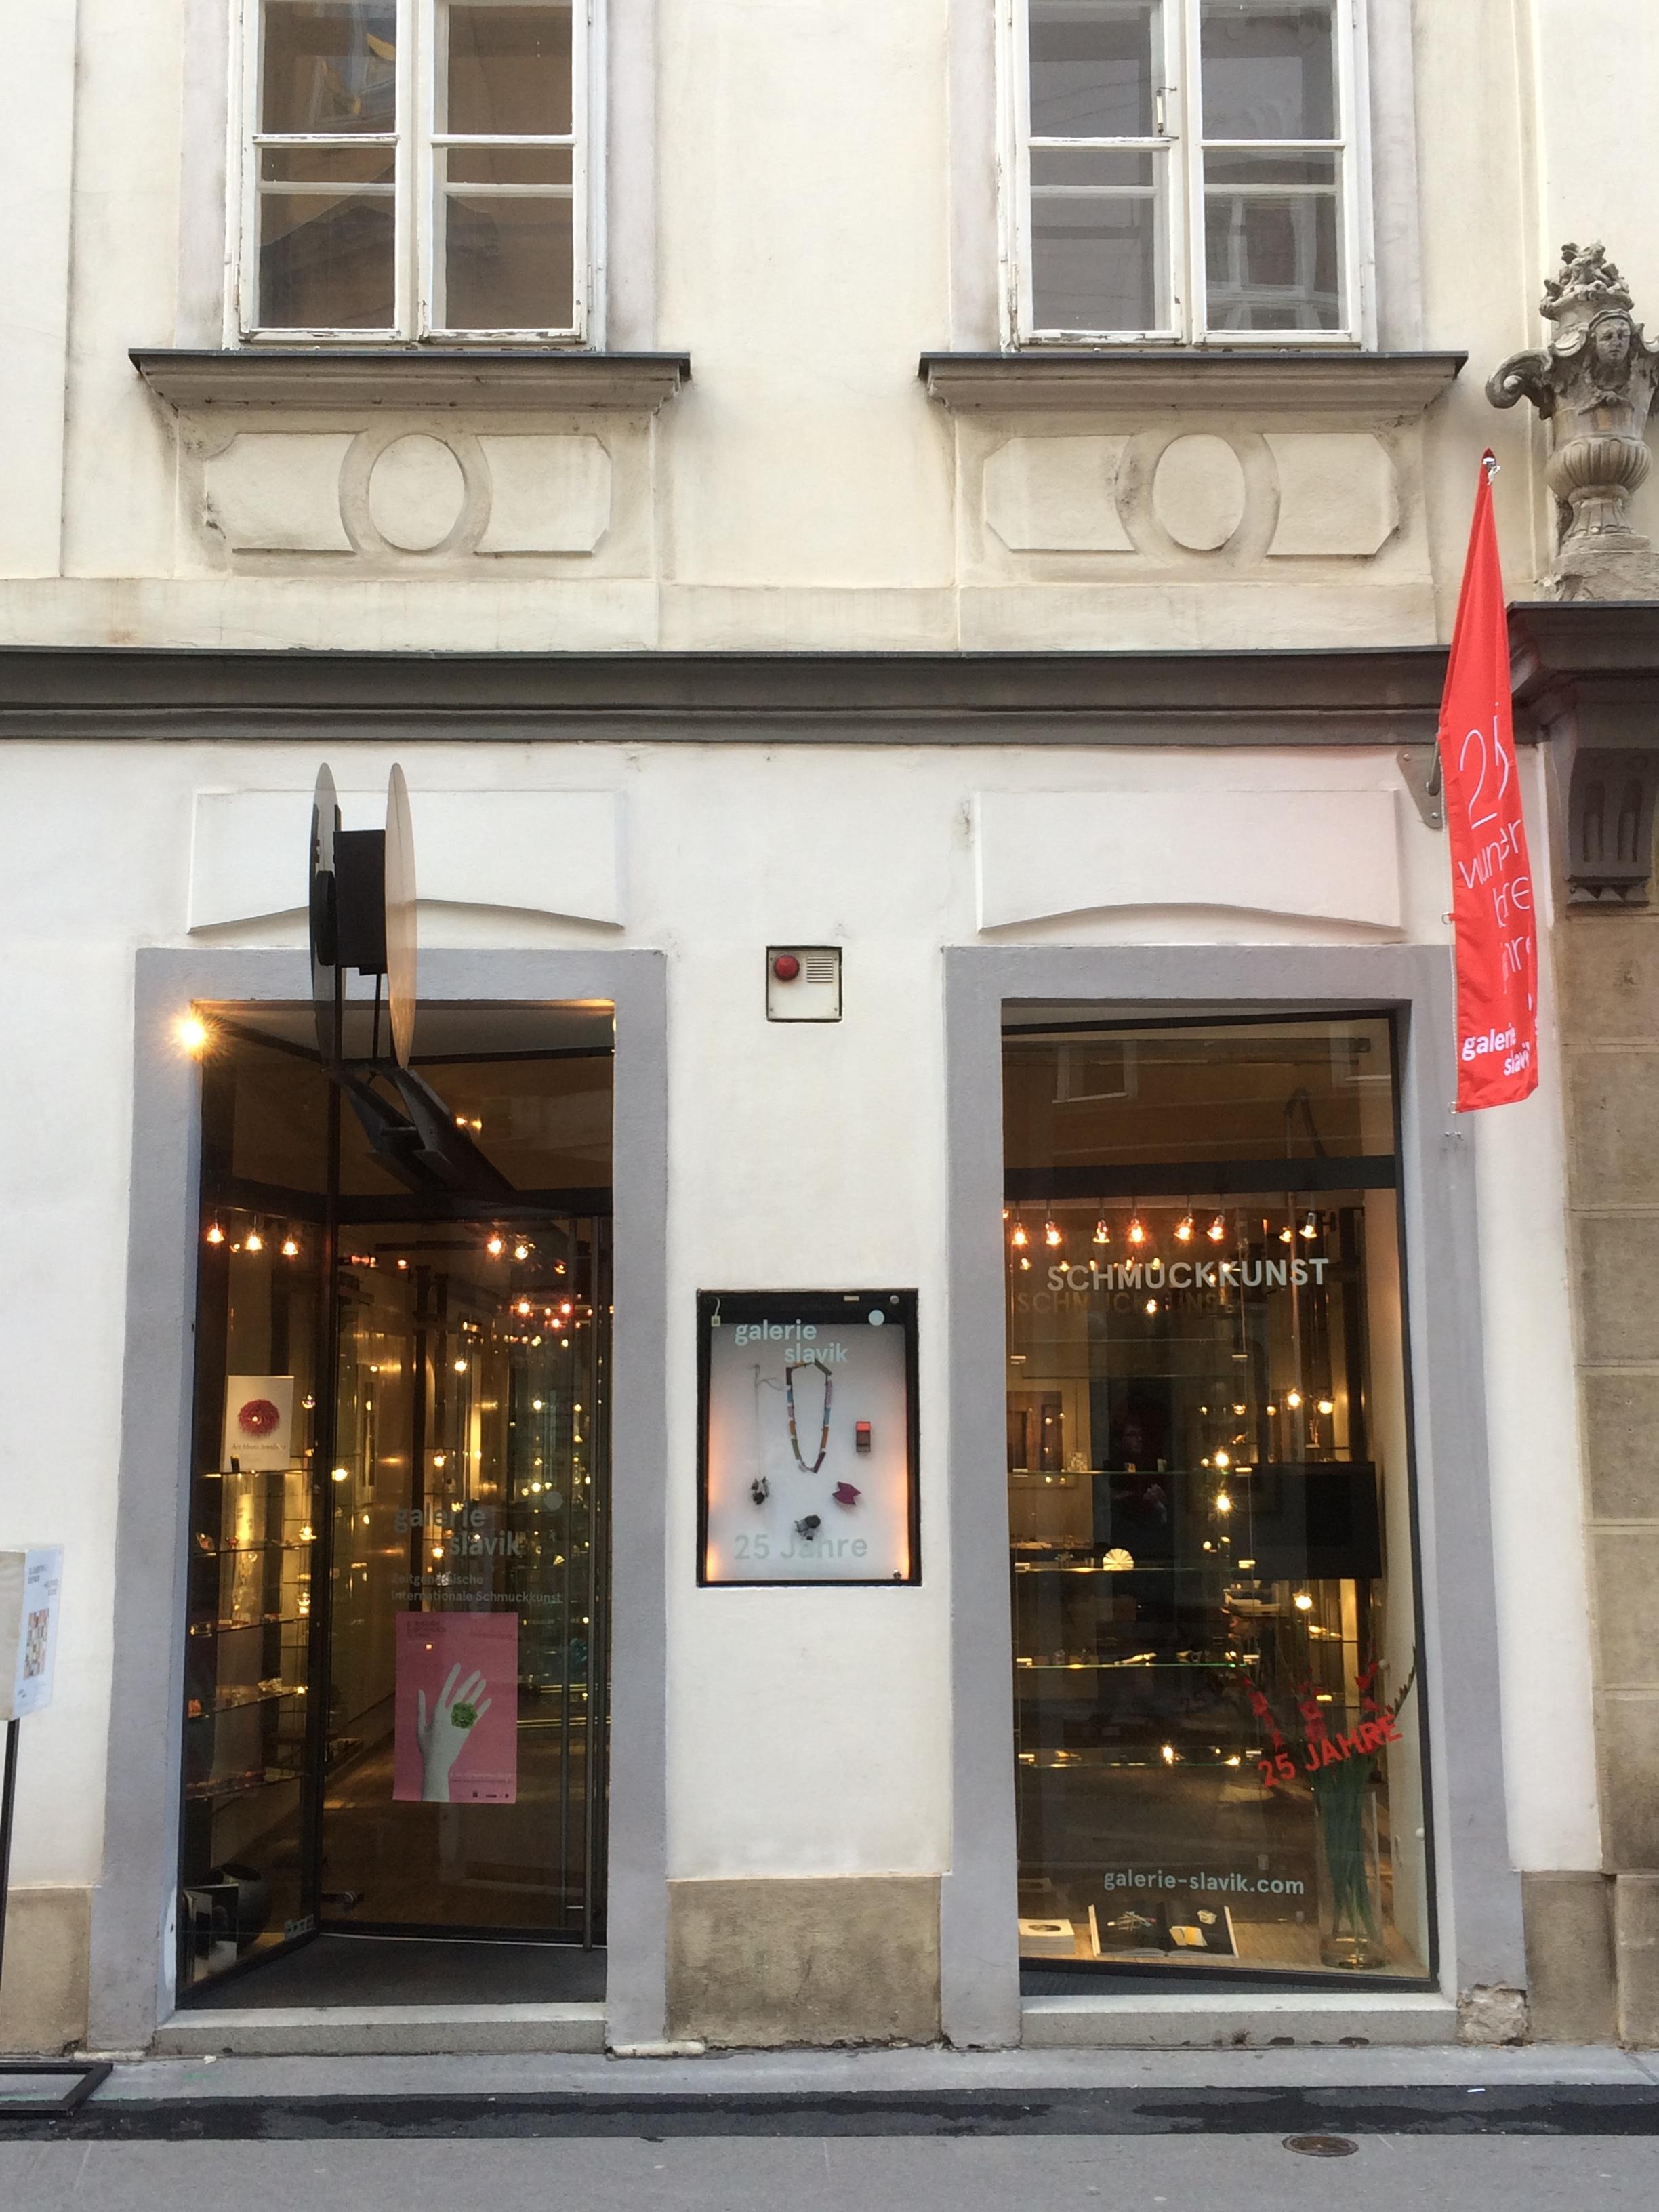 Galerie Slavik, Wenen, 2016, gevel